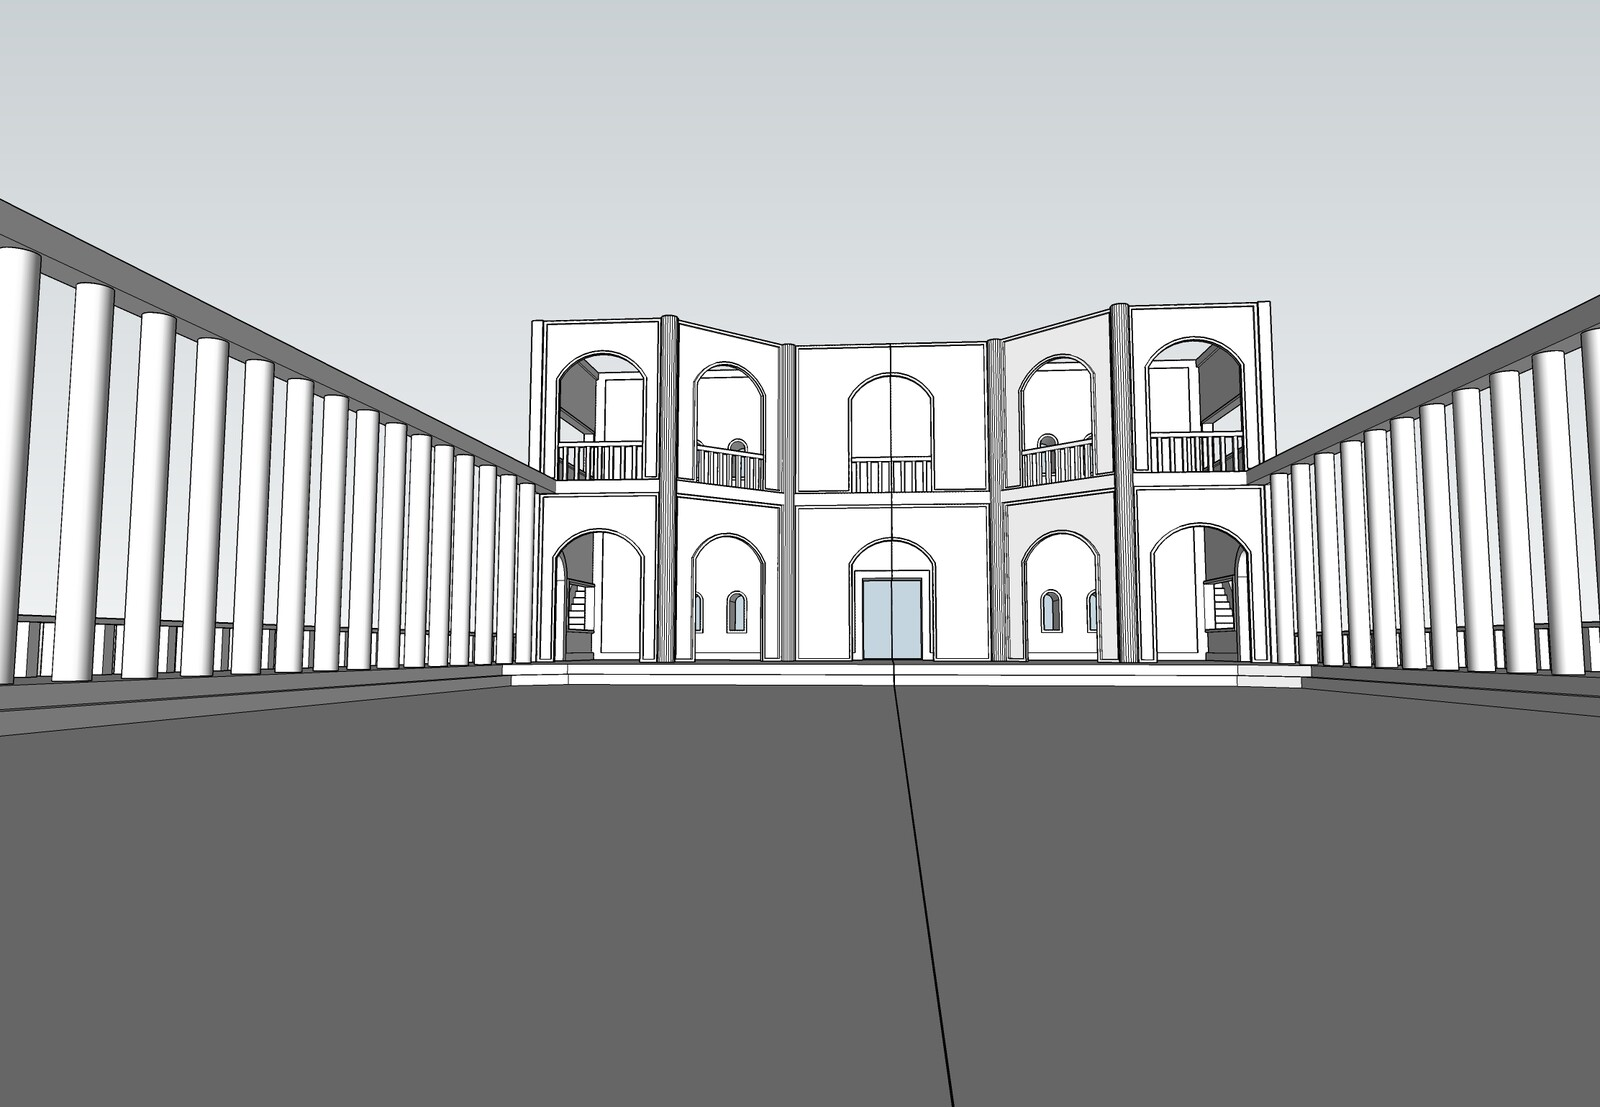 SketchUp Model - Full Spread